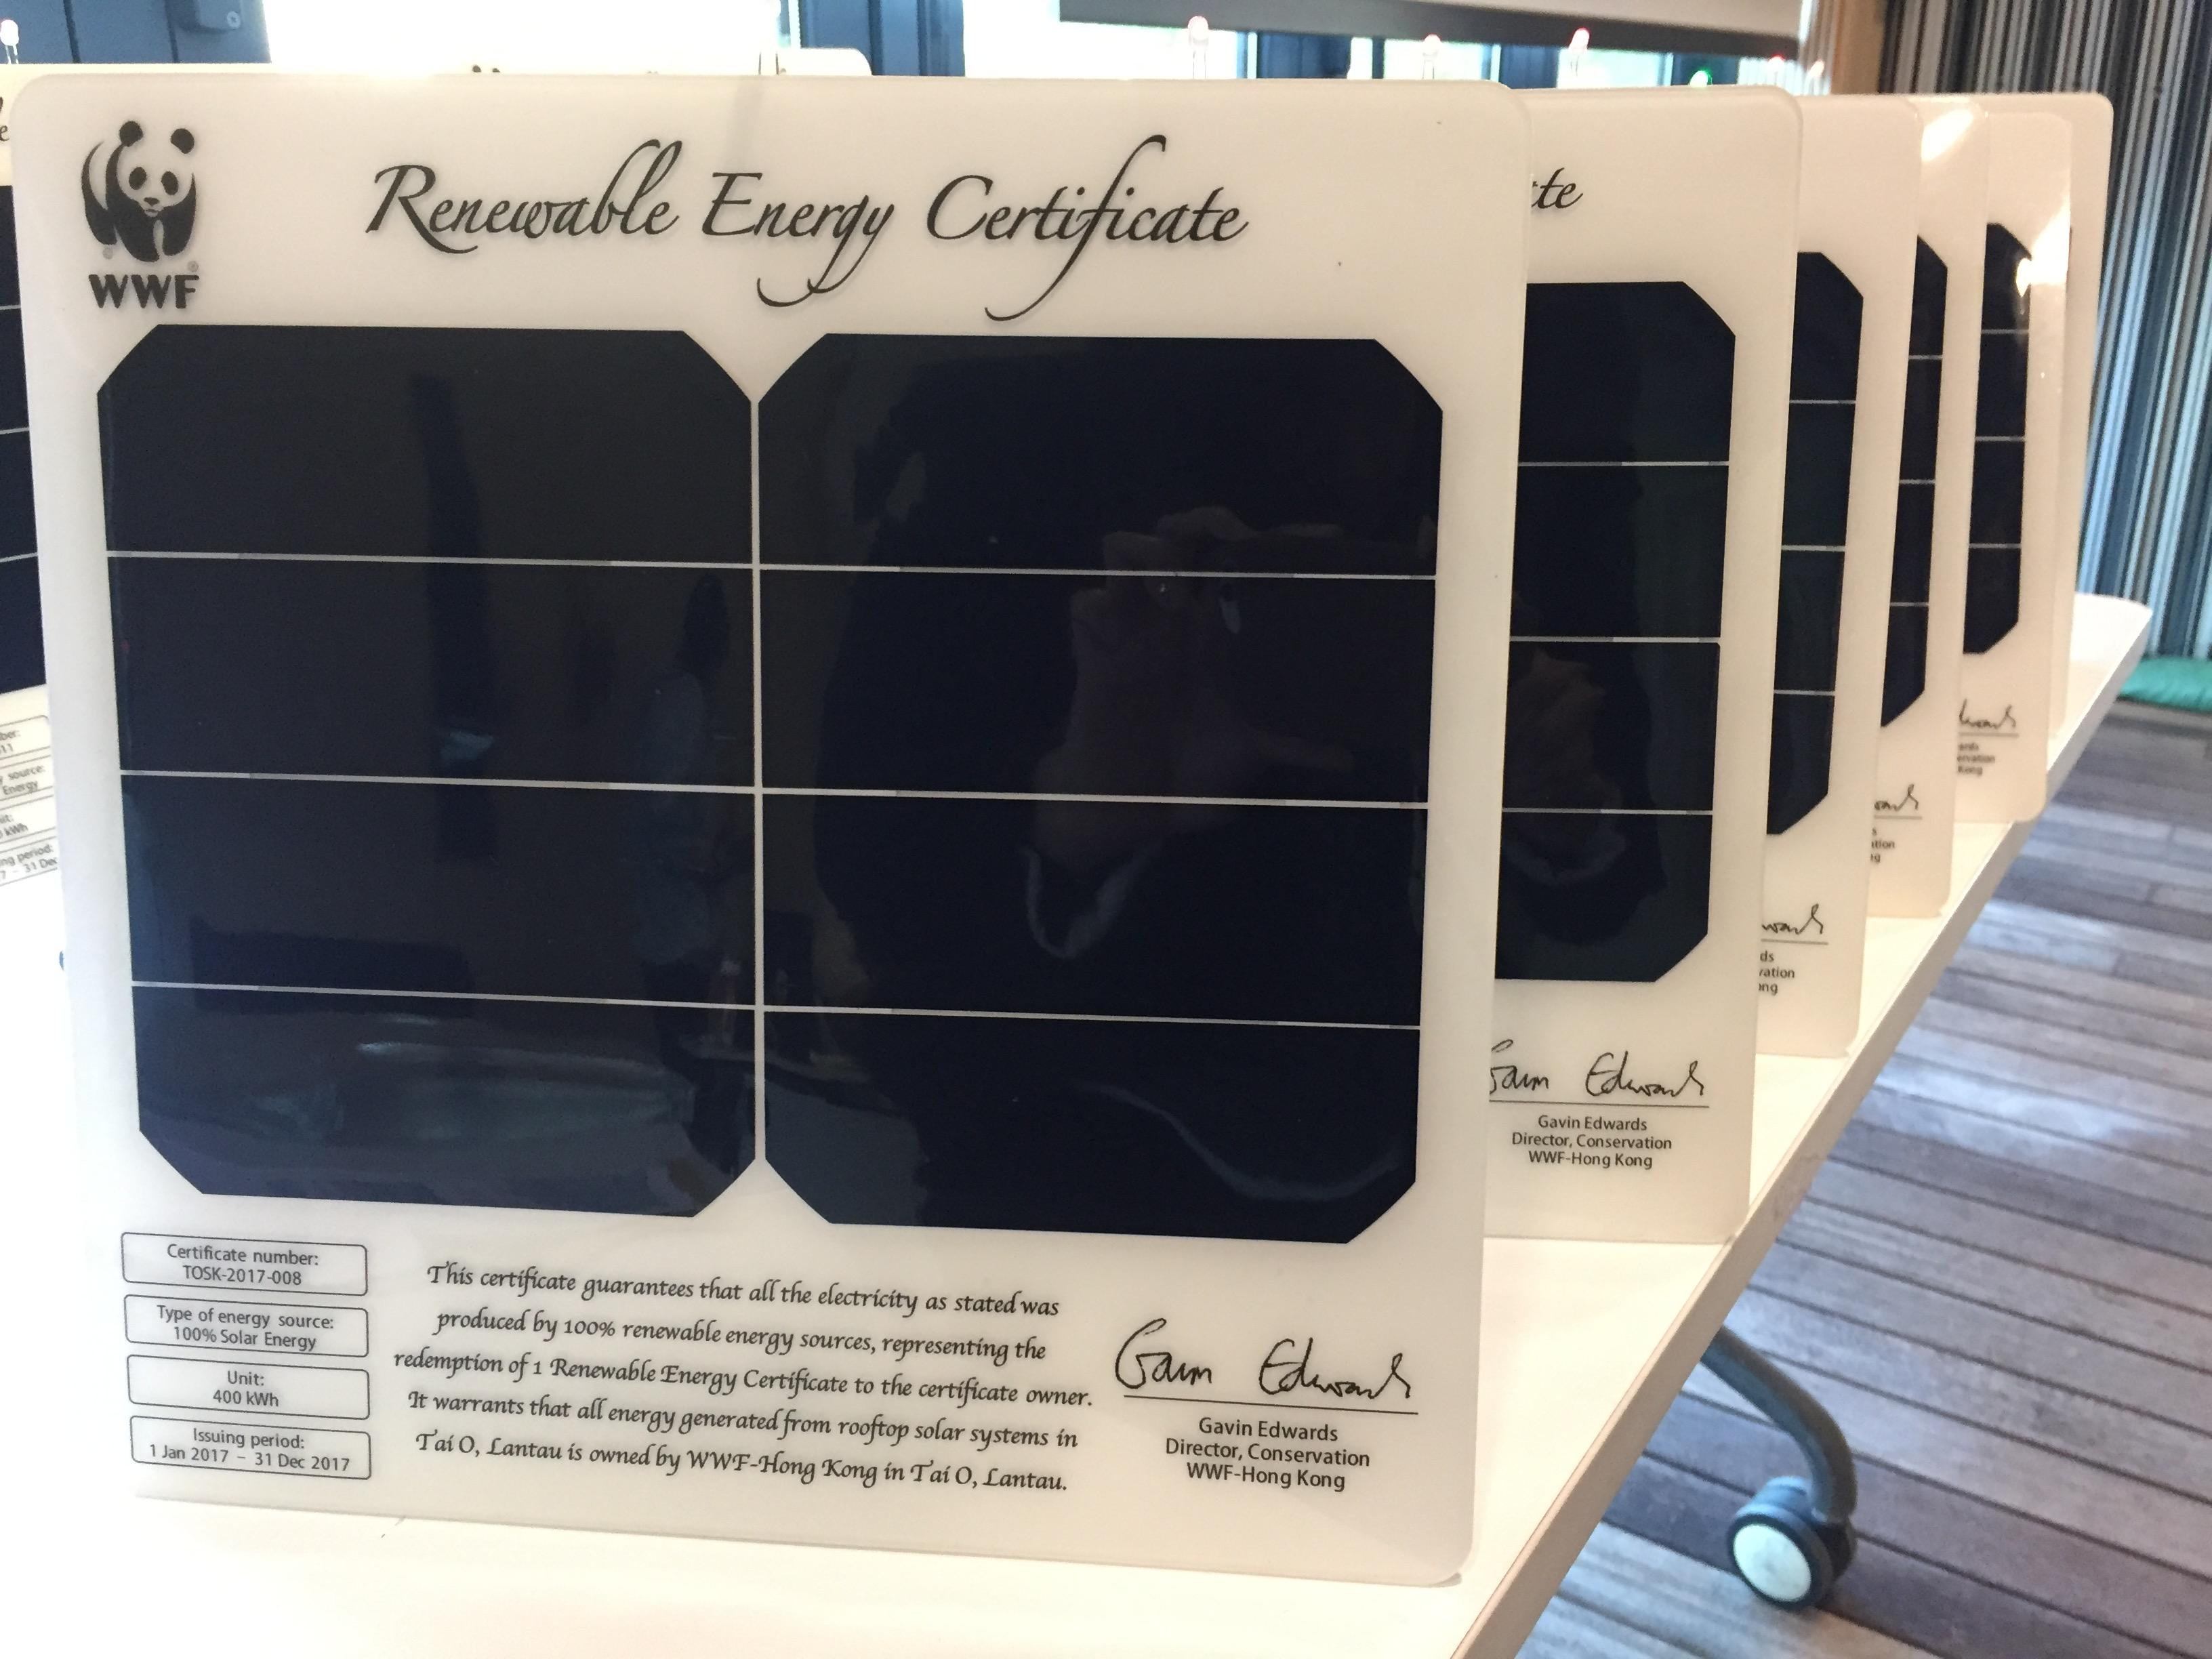 Launching hong kongs first renewable energy certificate wwf enlarge xflitez Gallery